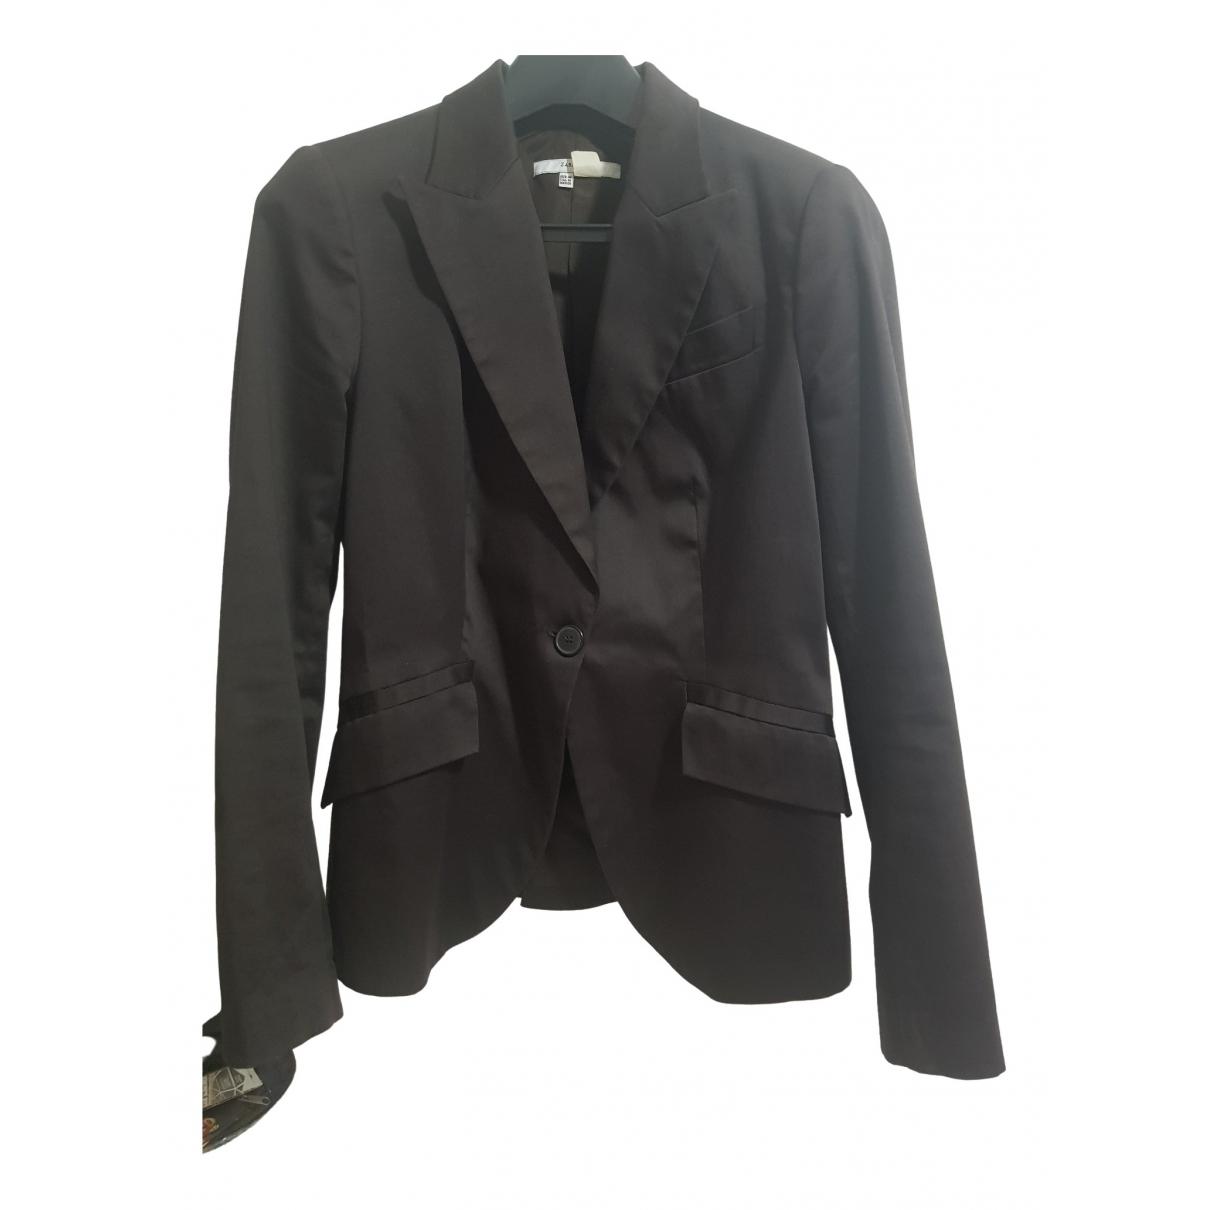 Zara \N Brown Cotton jacket for Women M International